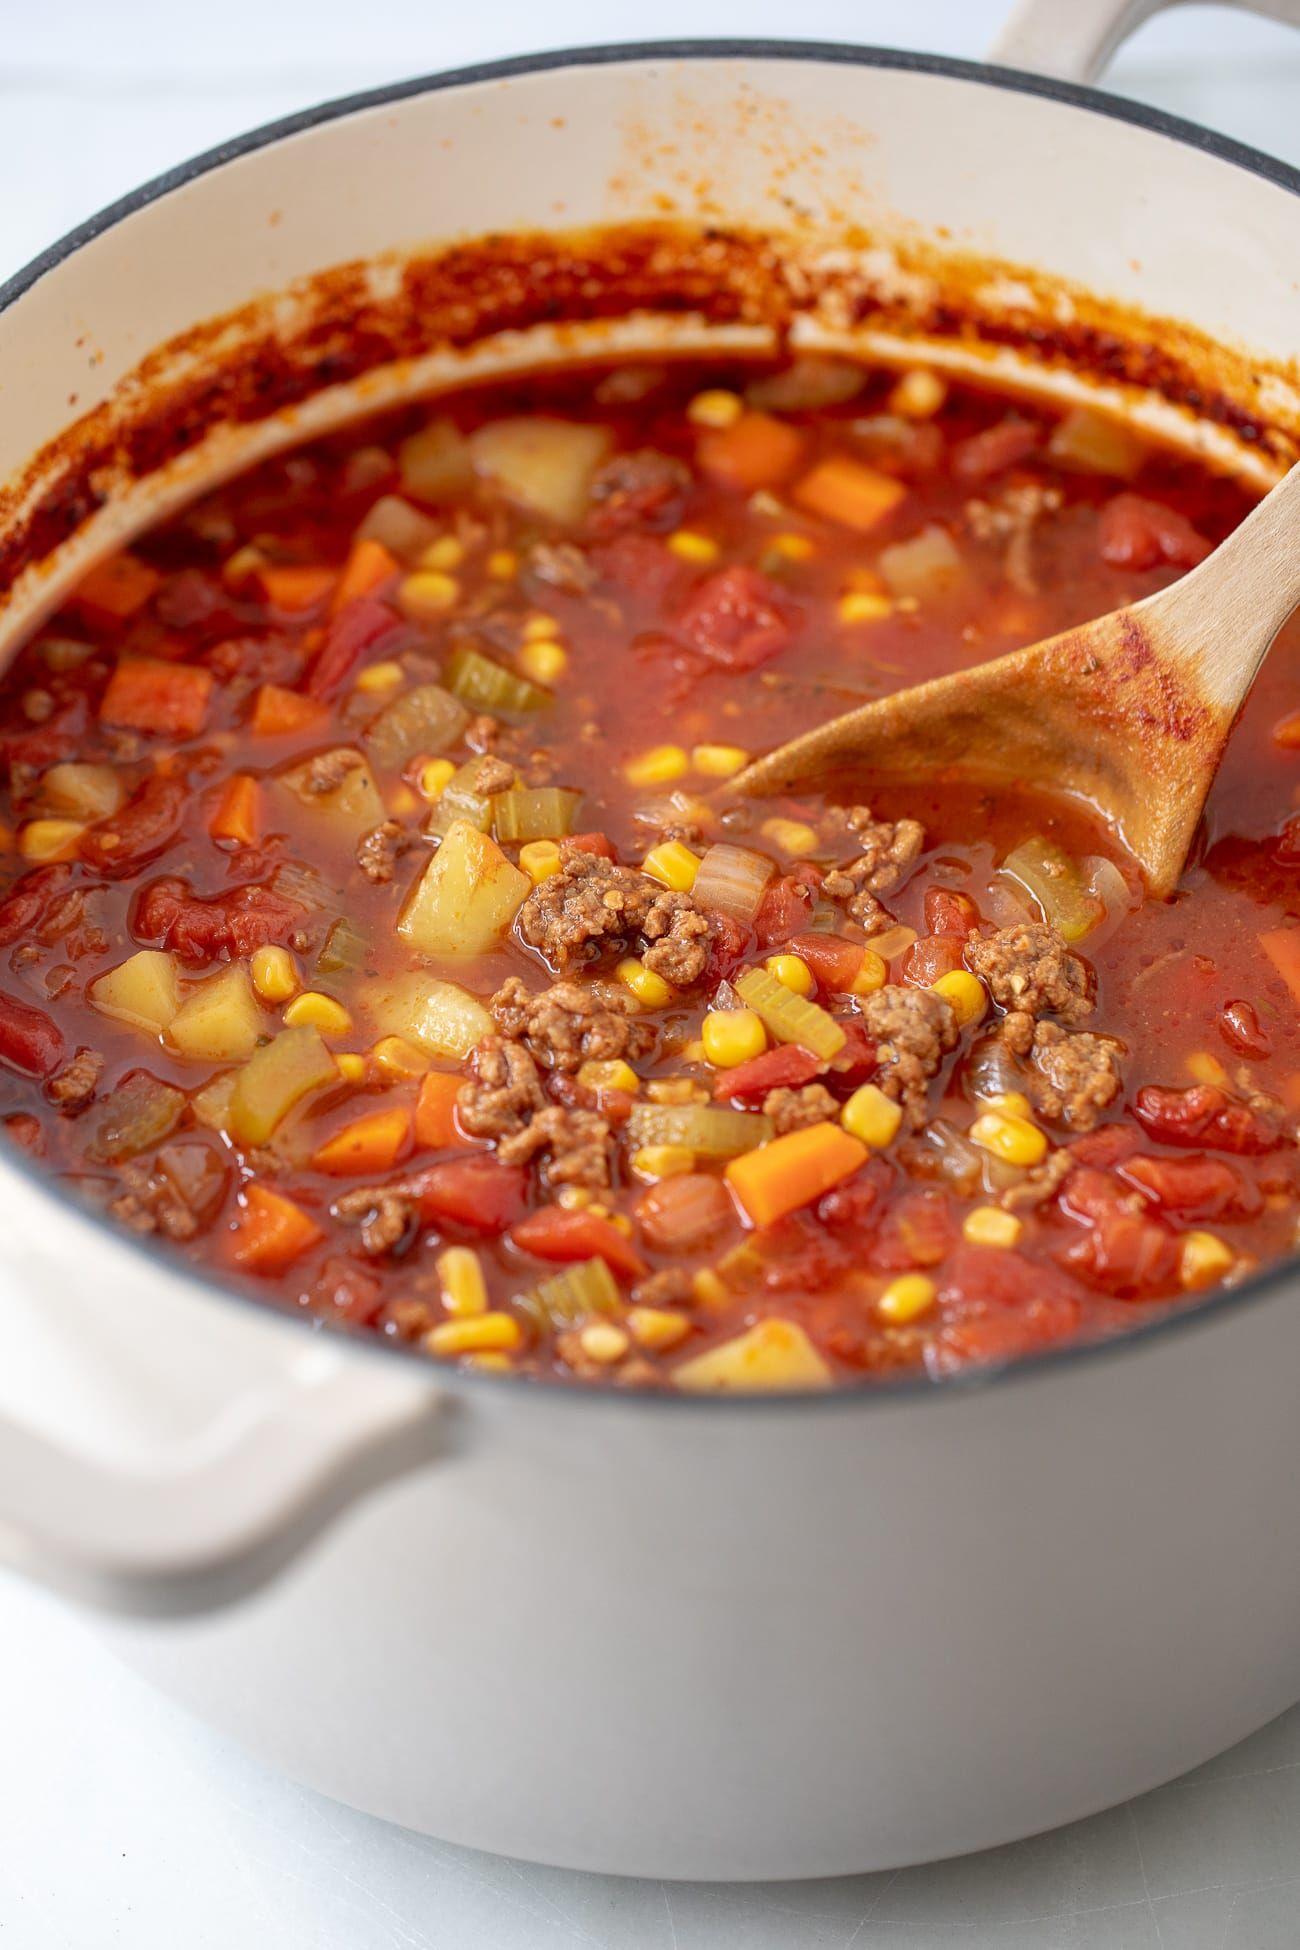 Easy Hamburger Soup Recipe Ground Beef And Vegetable Soup Recipe Easy Hamburger Soup Beef Soup Recipes Hamburger Soup